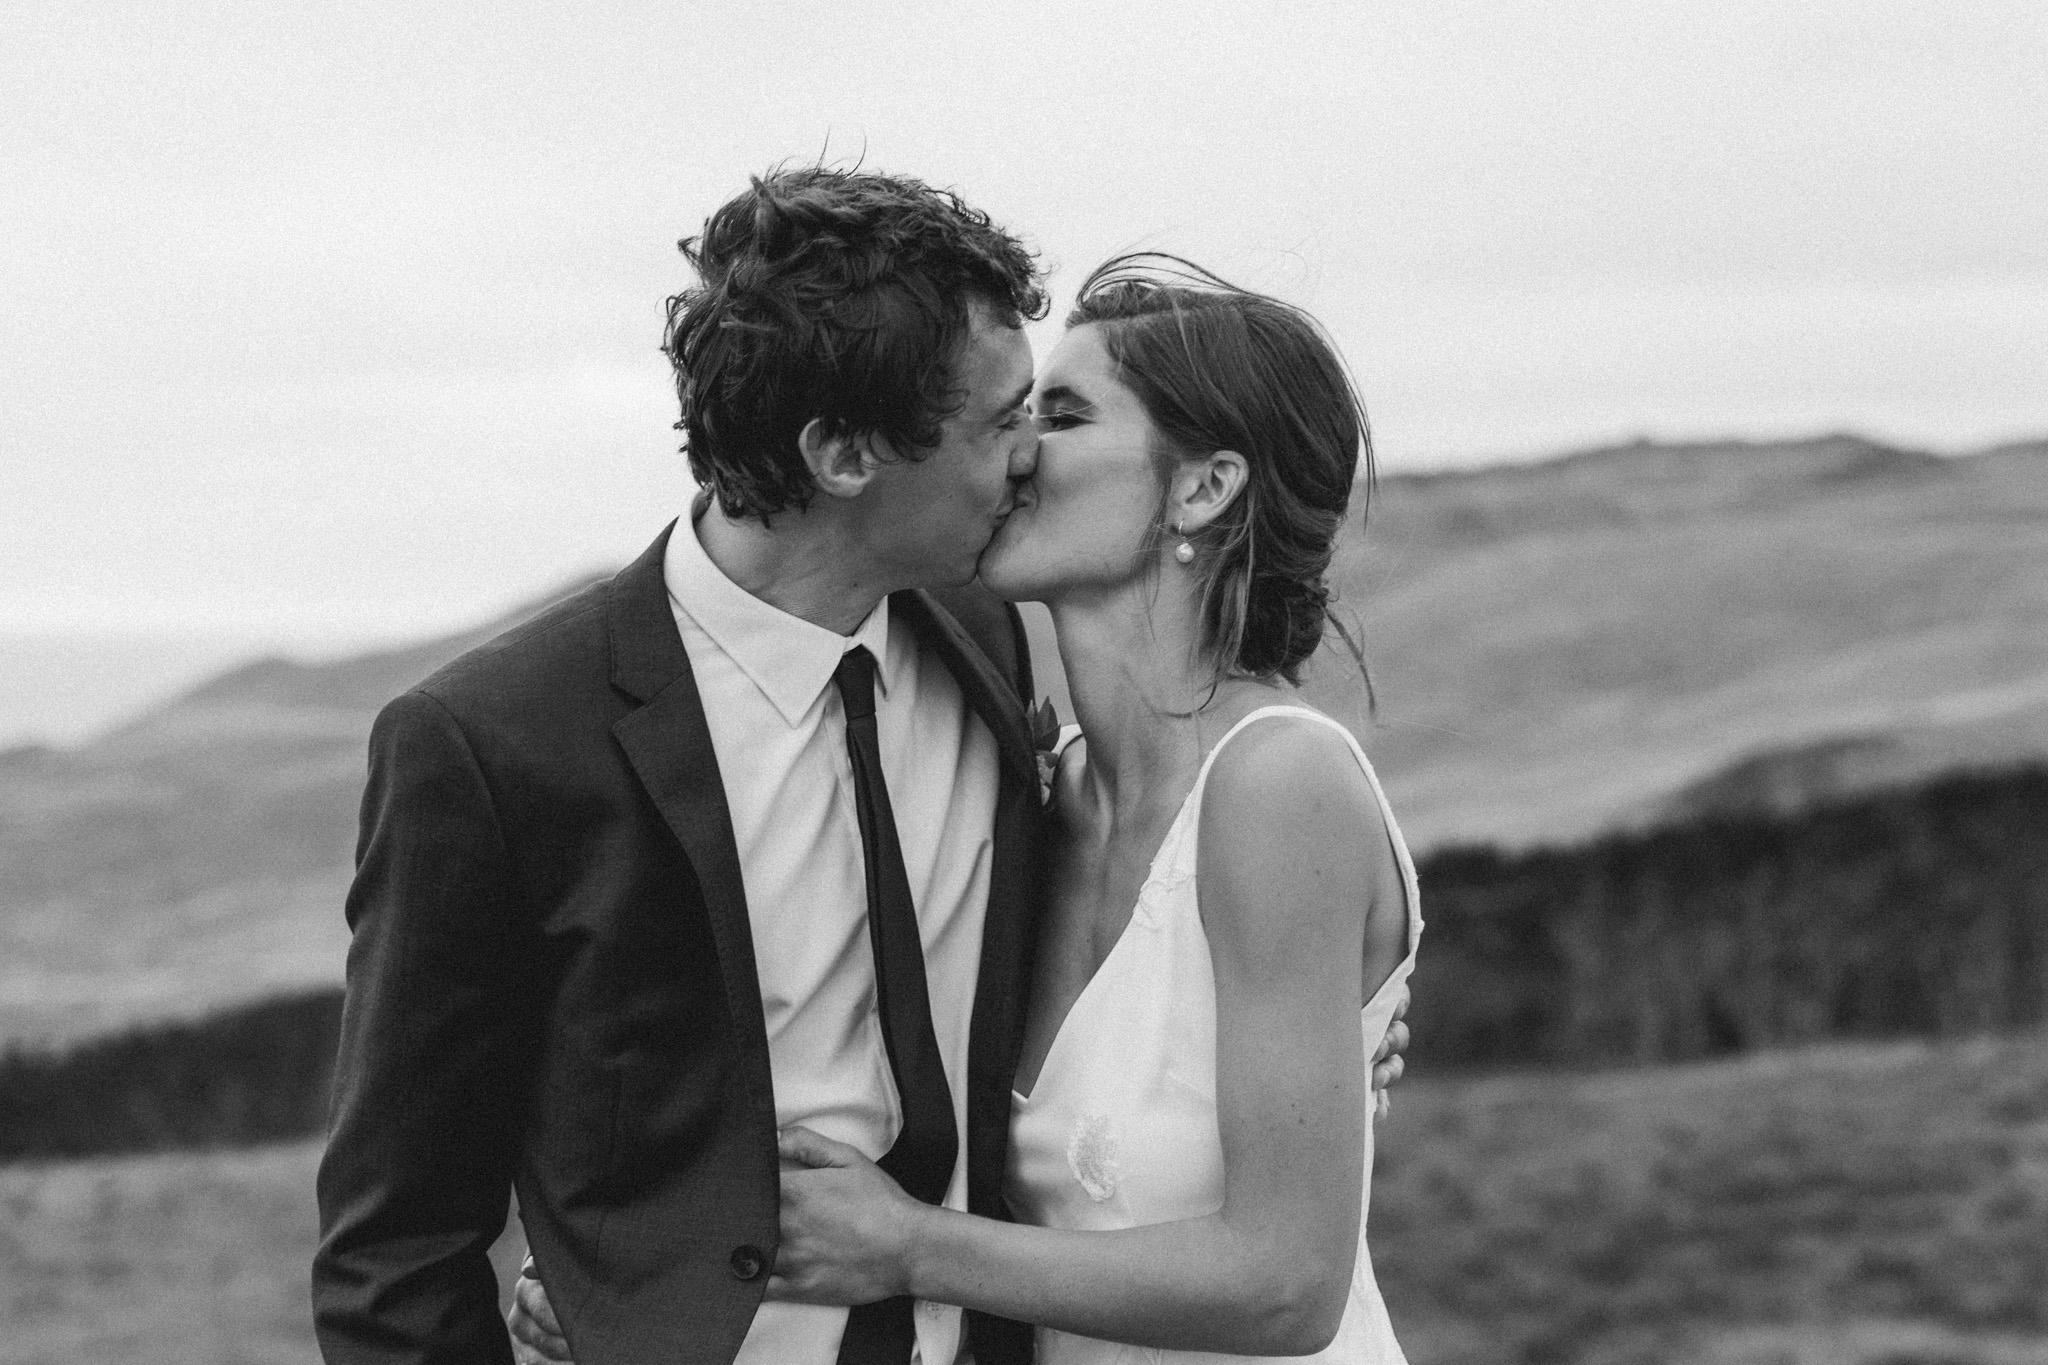 newfound-h-m-castaways-waiuku-auckland-wedding-photographer-183